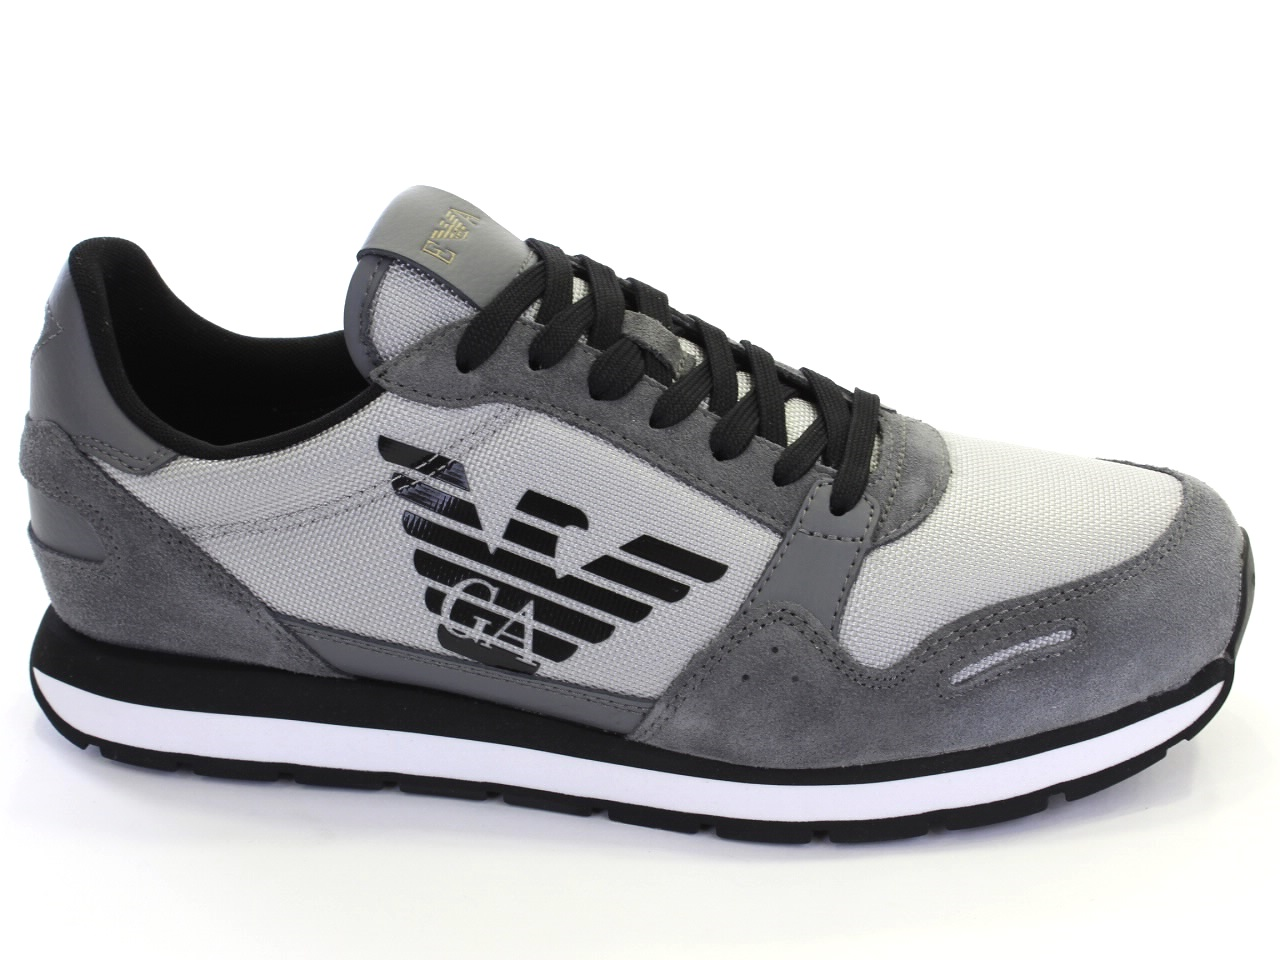 Sneakers and Espadrilles Armani Jeans, Emporio Armani - 529 X4X215